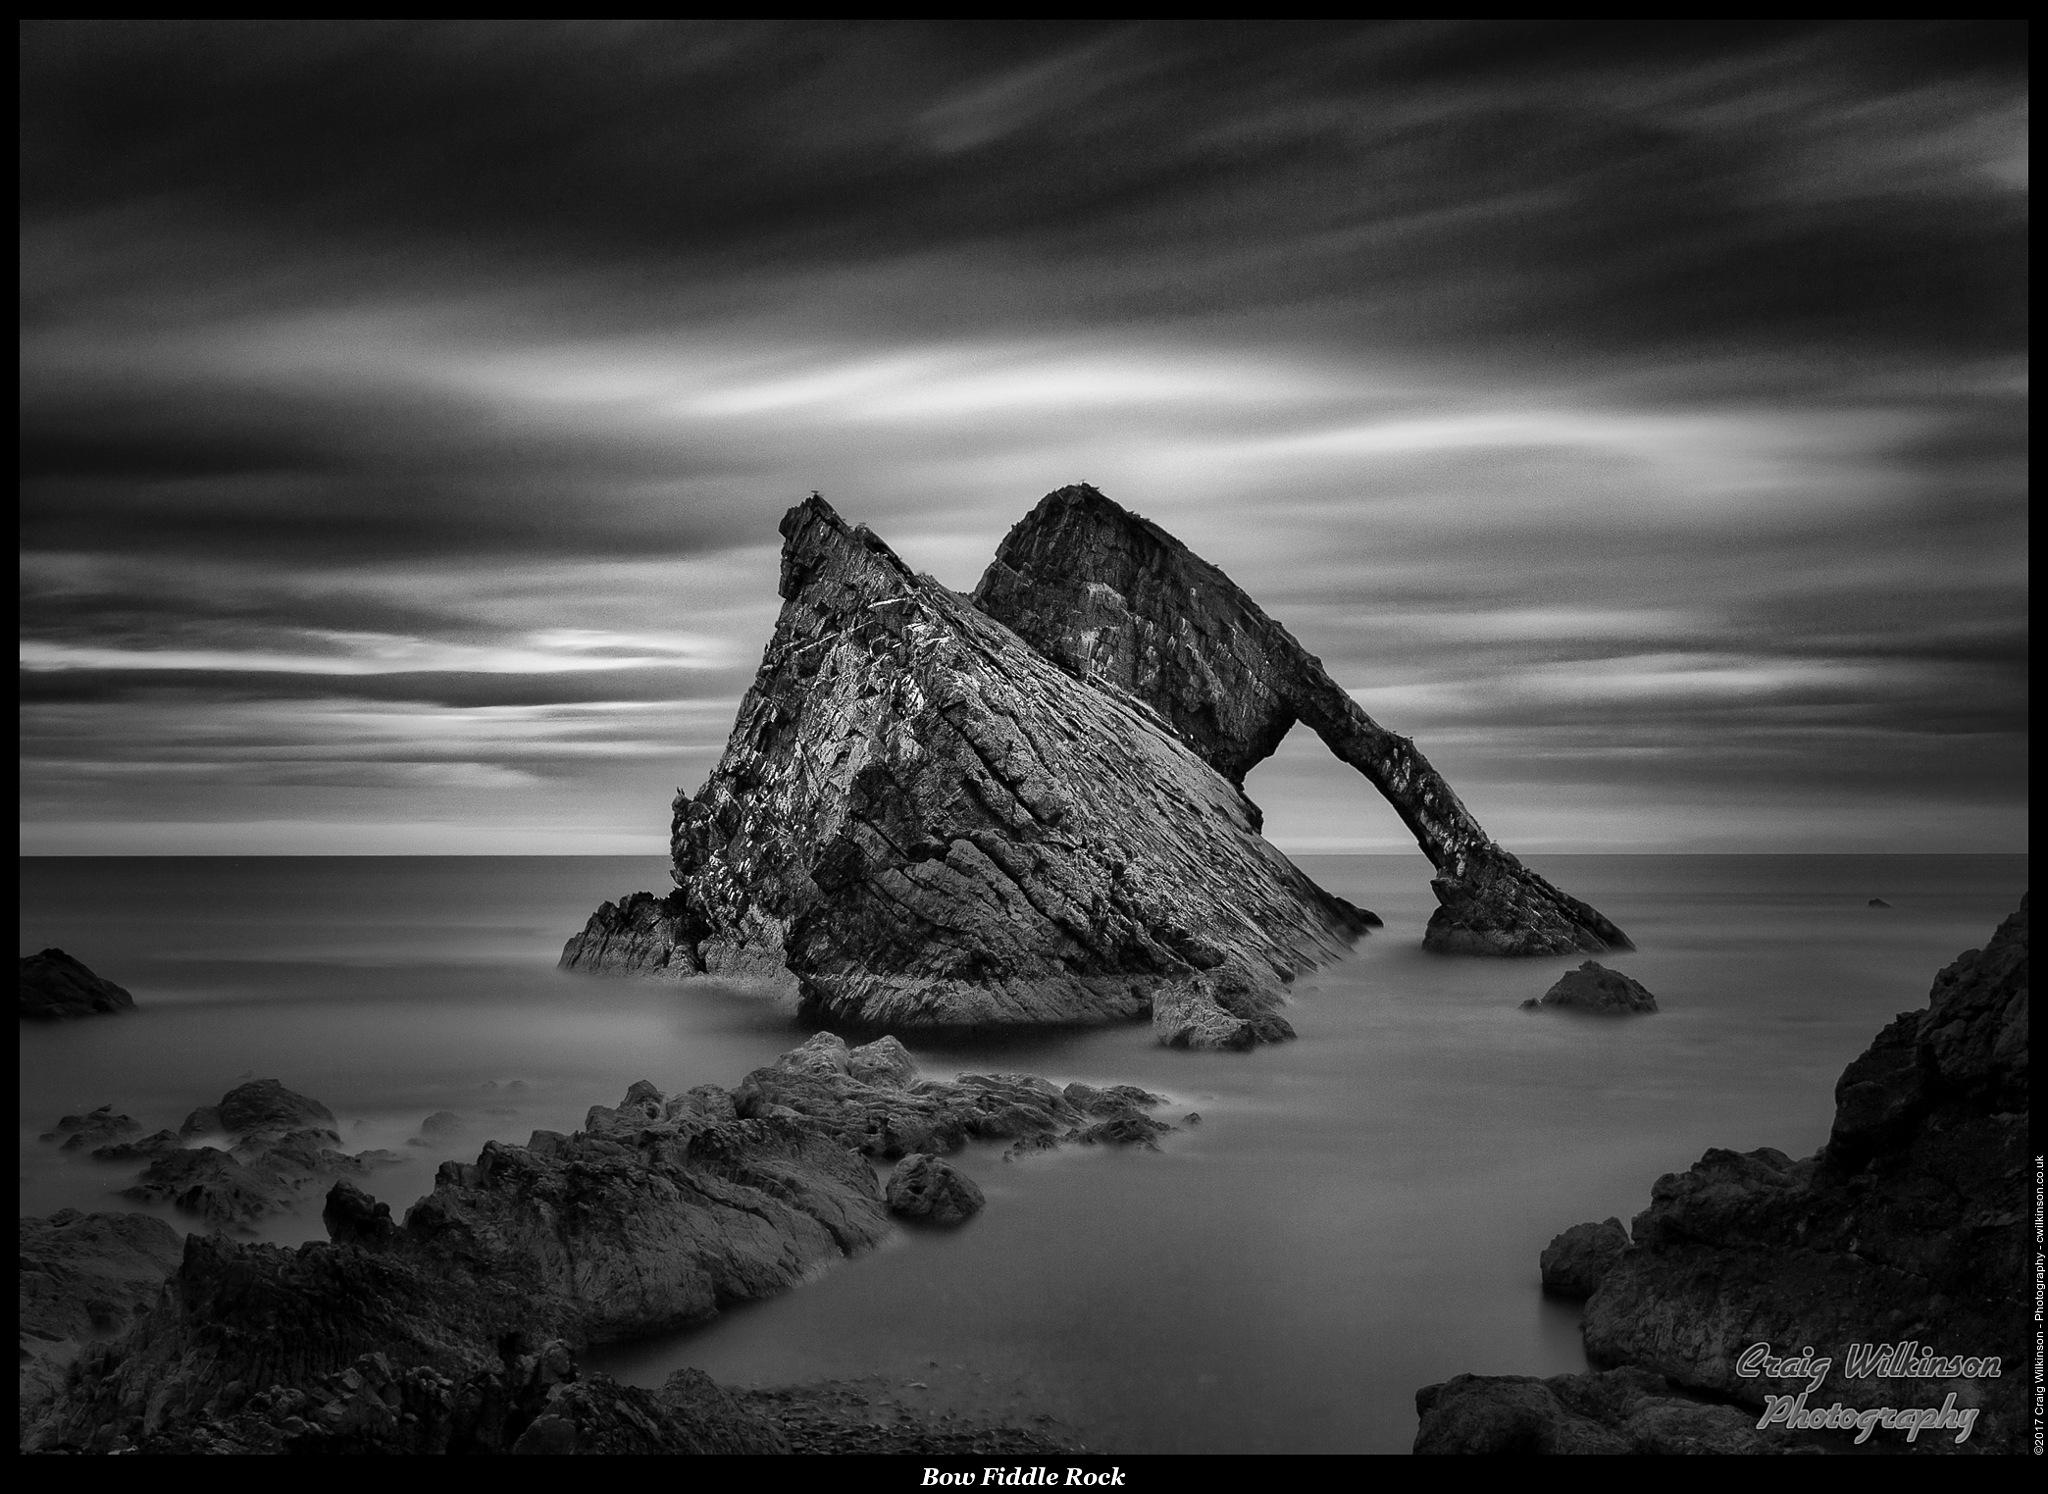 Bow Fiddle Rock , Portknockie by Craig Wilkinson